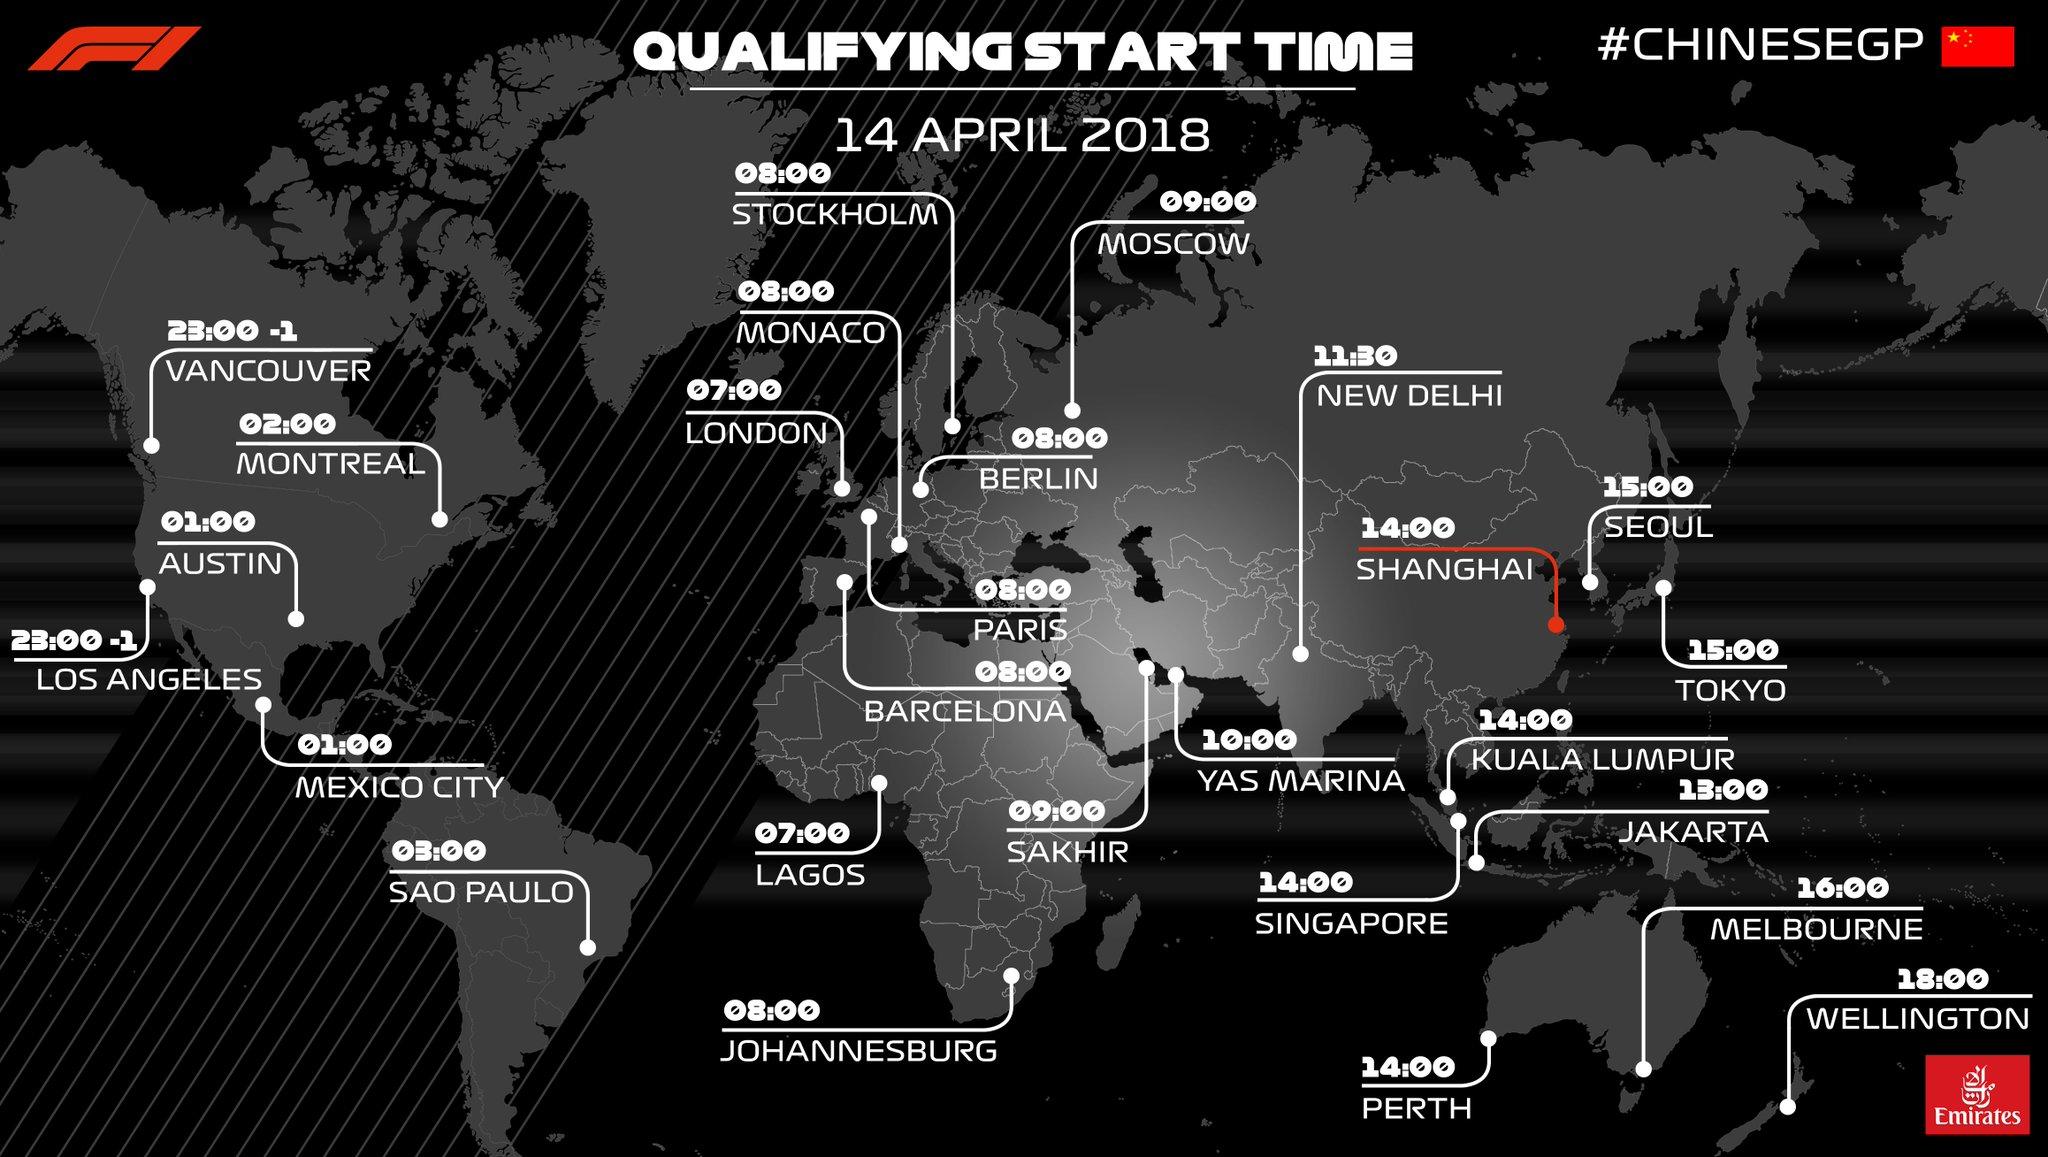 Chinese GP 2018 Qualifying Race Live Stream